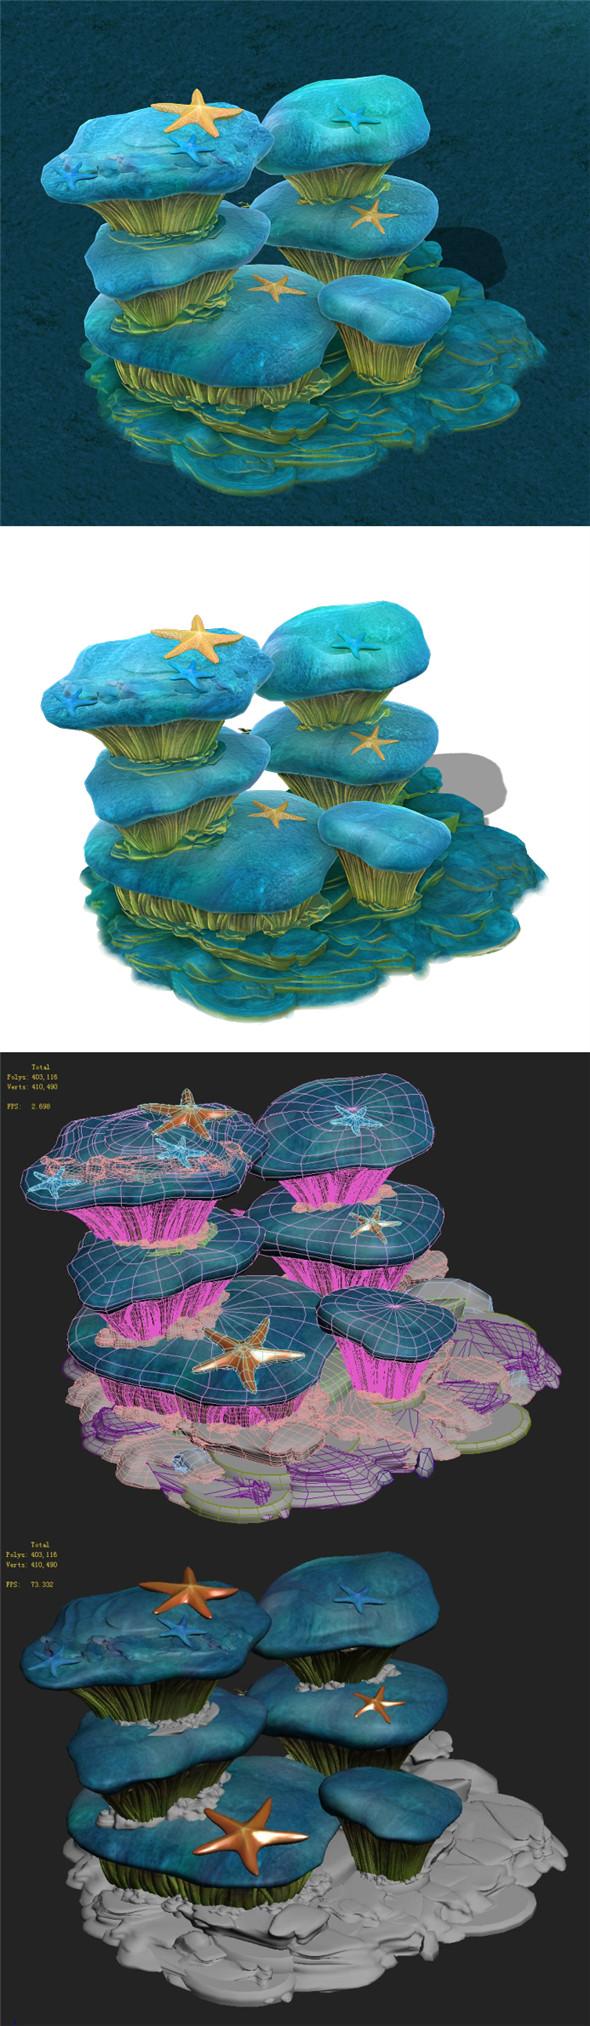 Submarine Cartoon World - Dream Xia Township Rock Wall 2 - 3DOcean Item for Sale